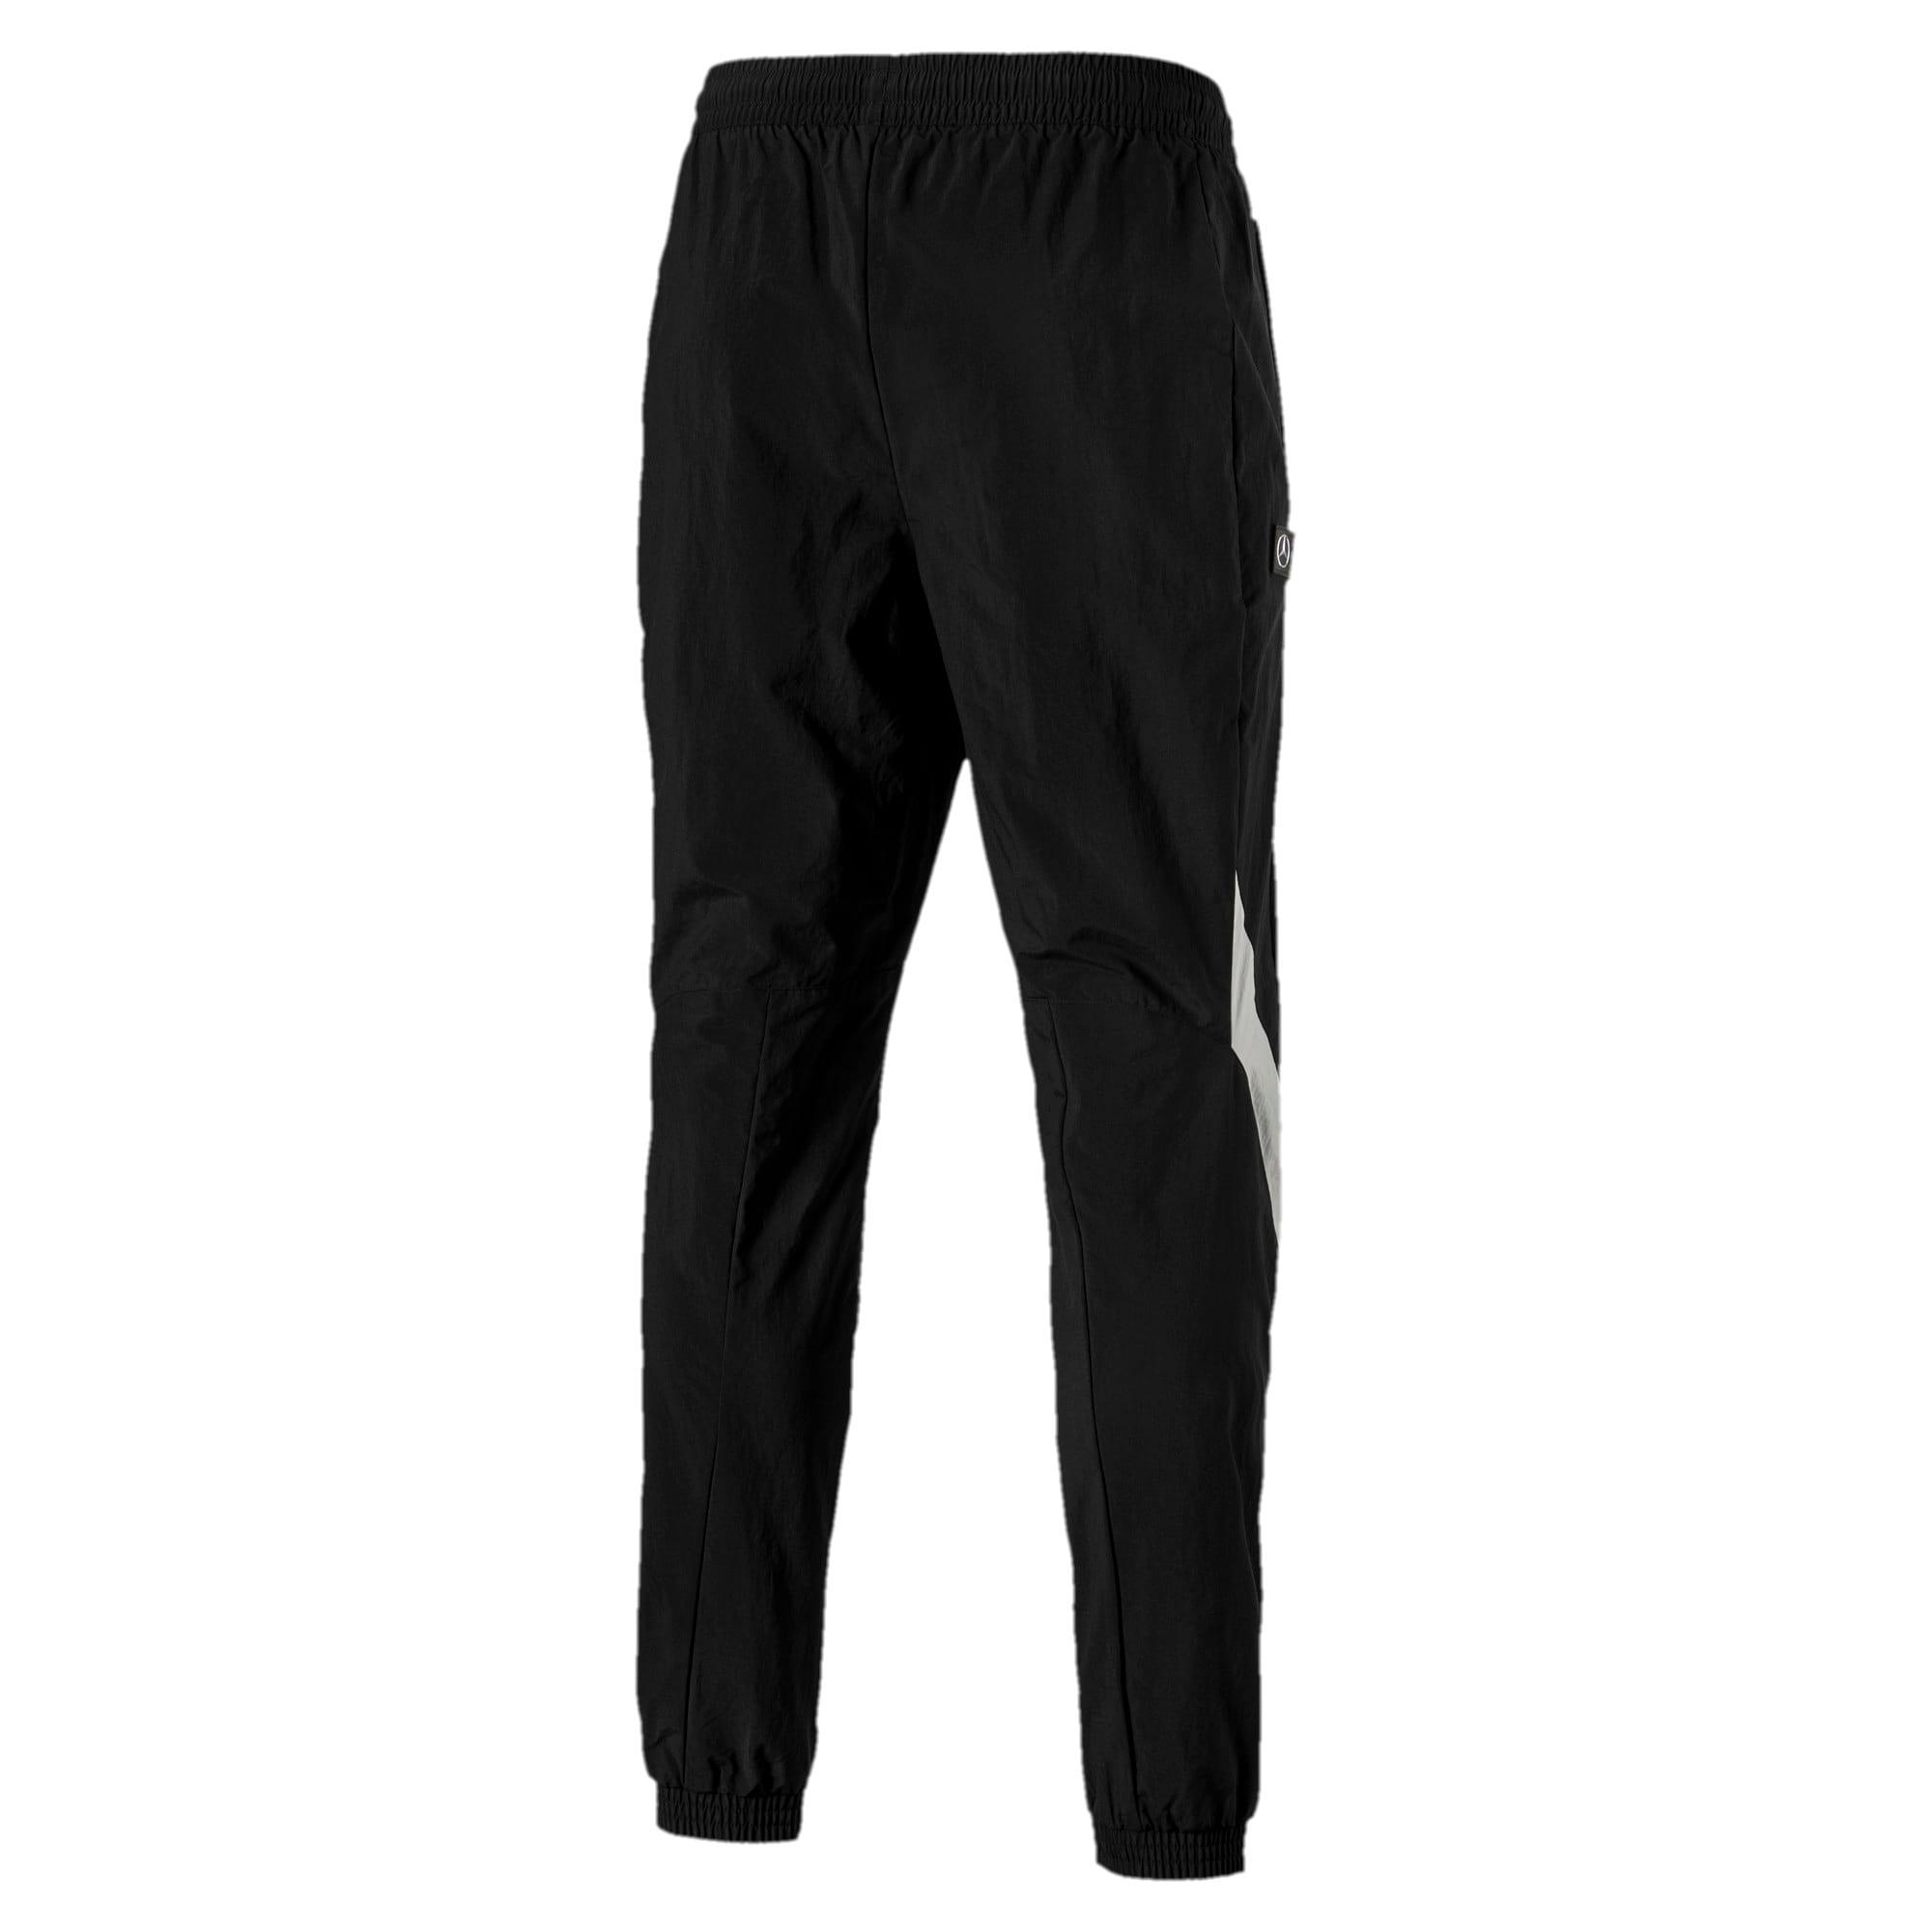 Thumbnail 2 of MERCEDES AMG PETRONAS Men's Woven Pants, Puma Black, medium